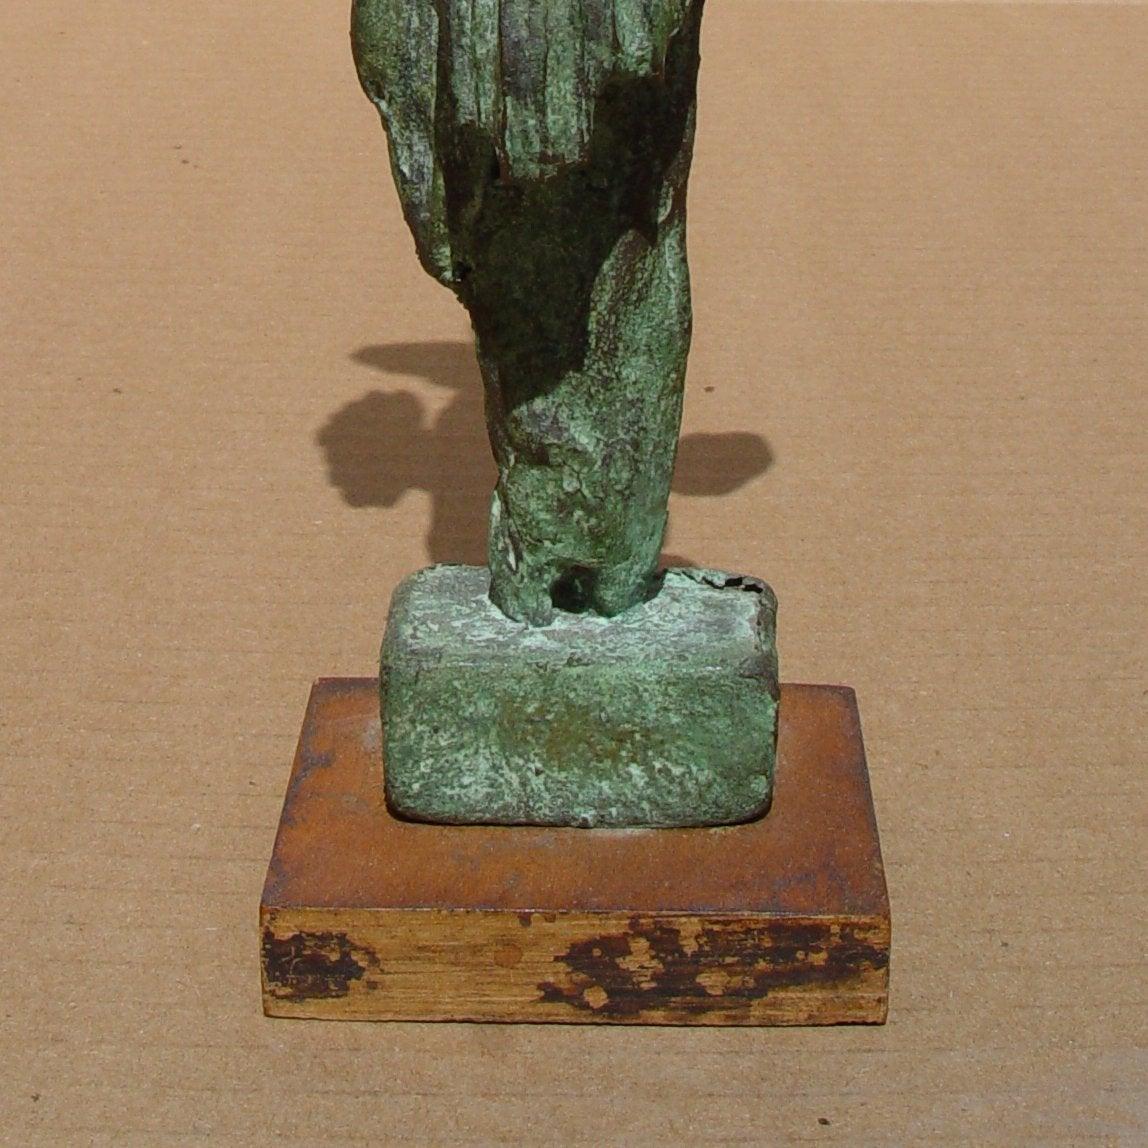 Totem - Cubist Sculpture by Mirko Basaldella